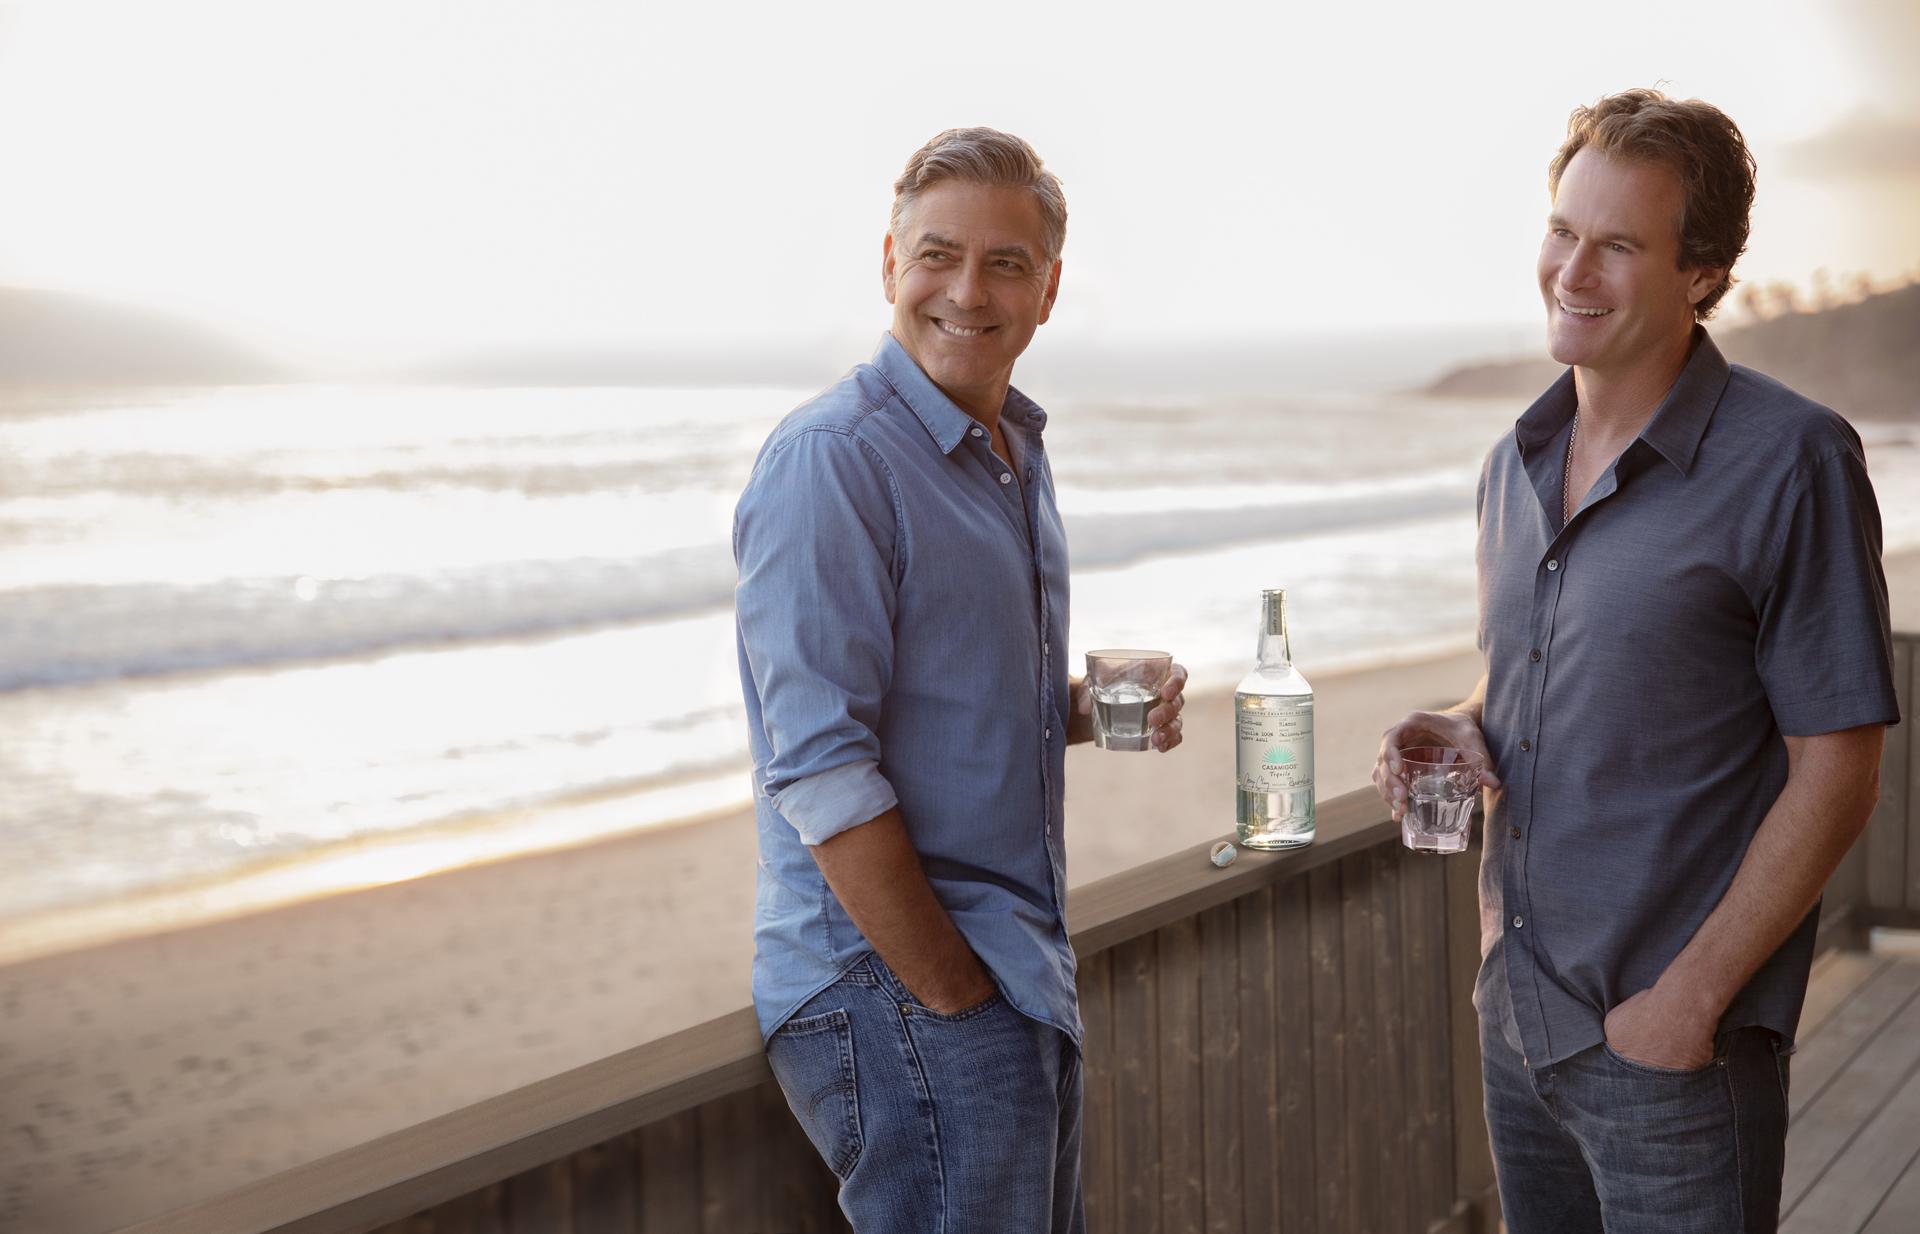 George Clooney and Rande Gerber - Casamigos Tequila